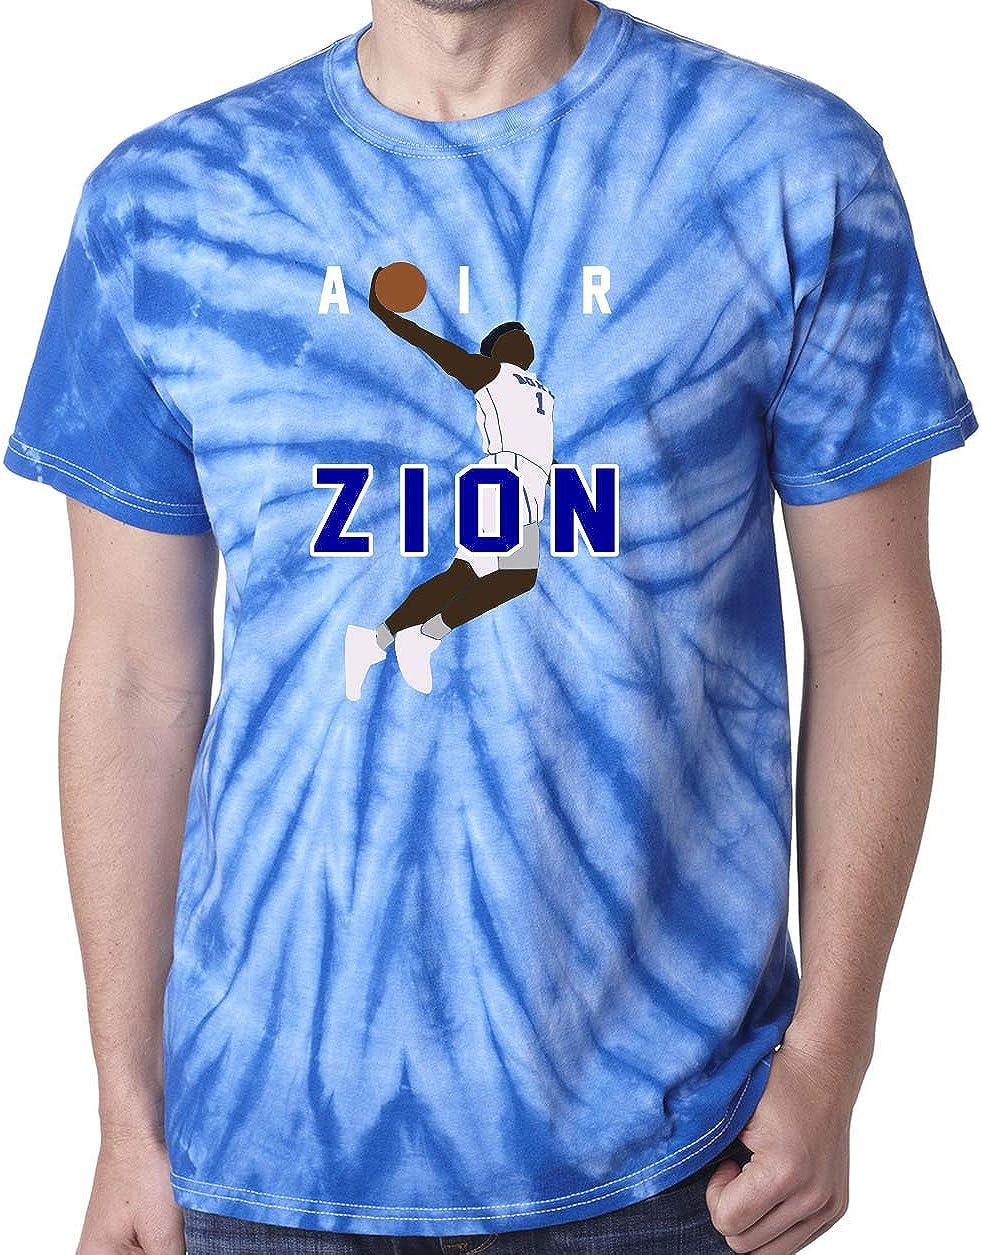 Tie-Dye blau Zion Duke blau Devils Luft Pic T-Shirt